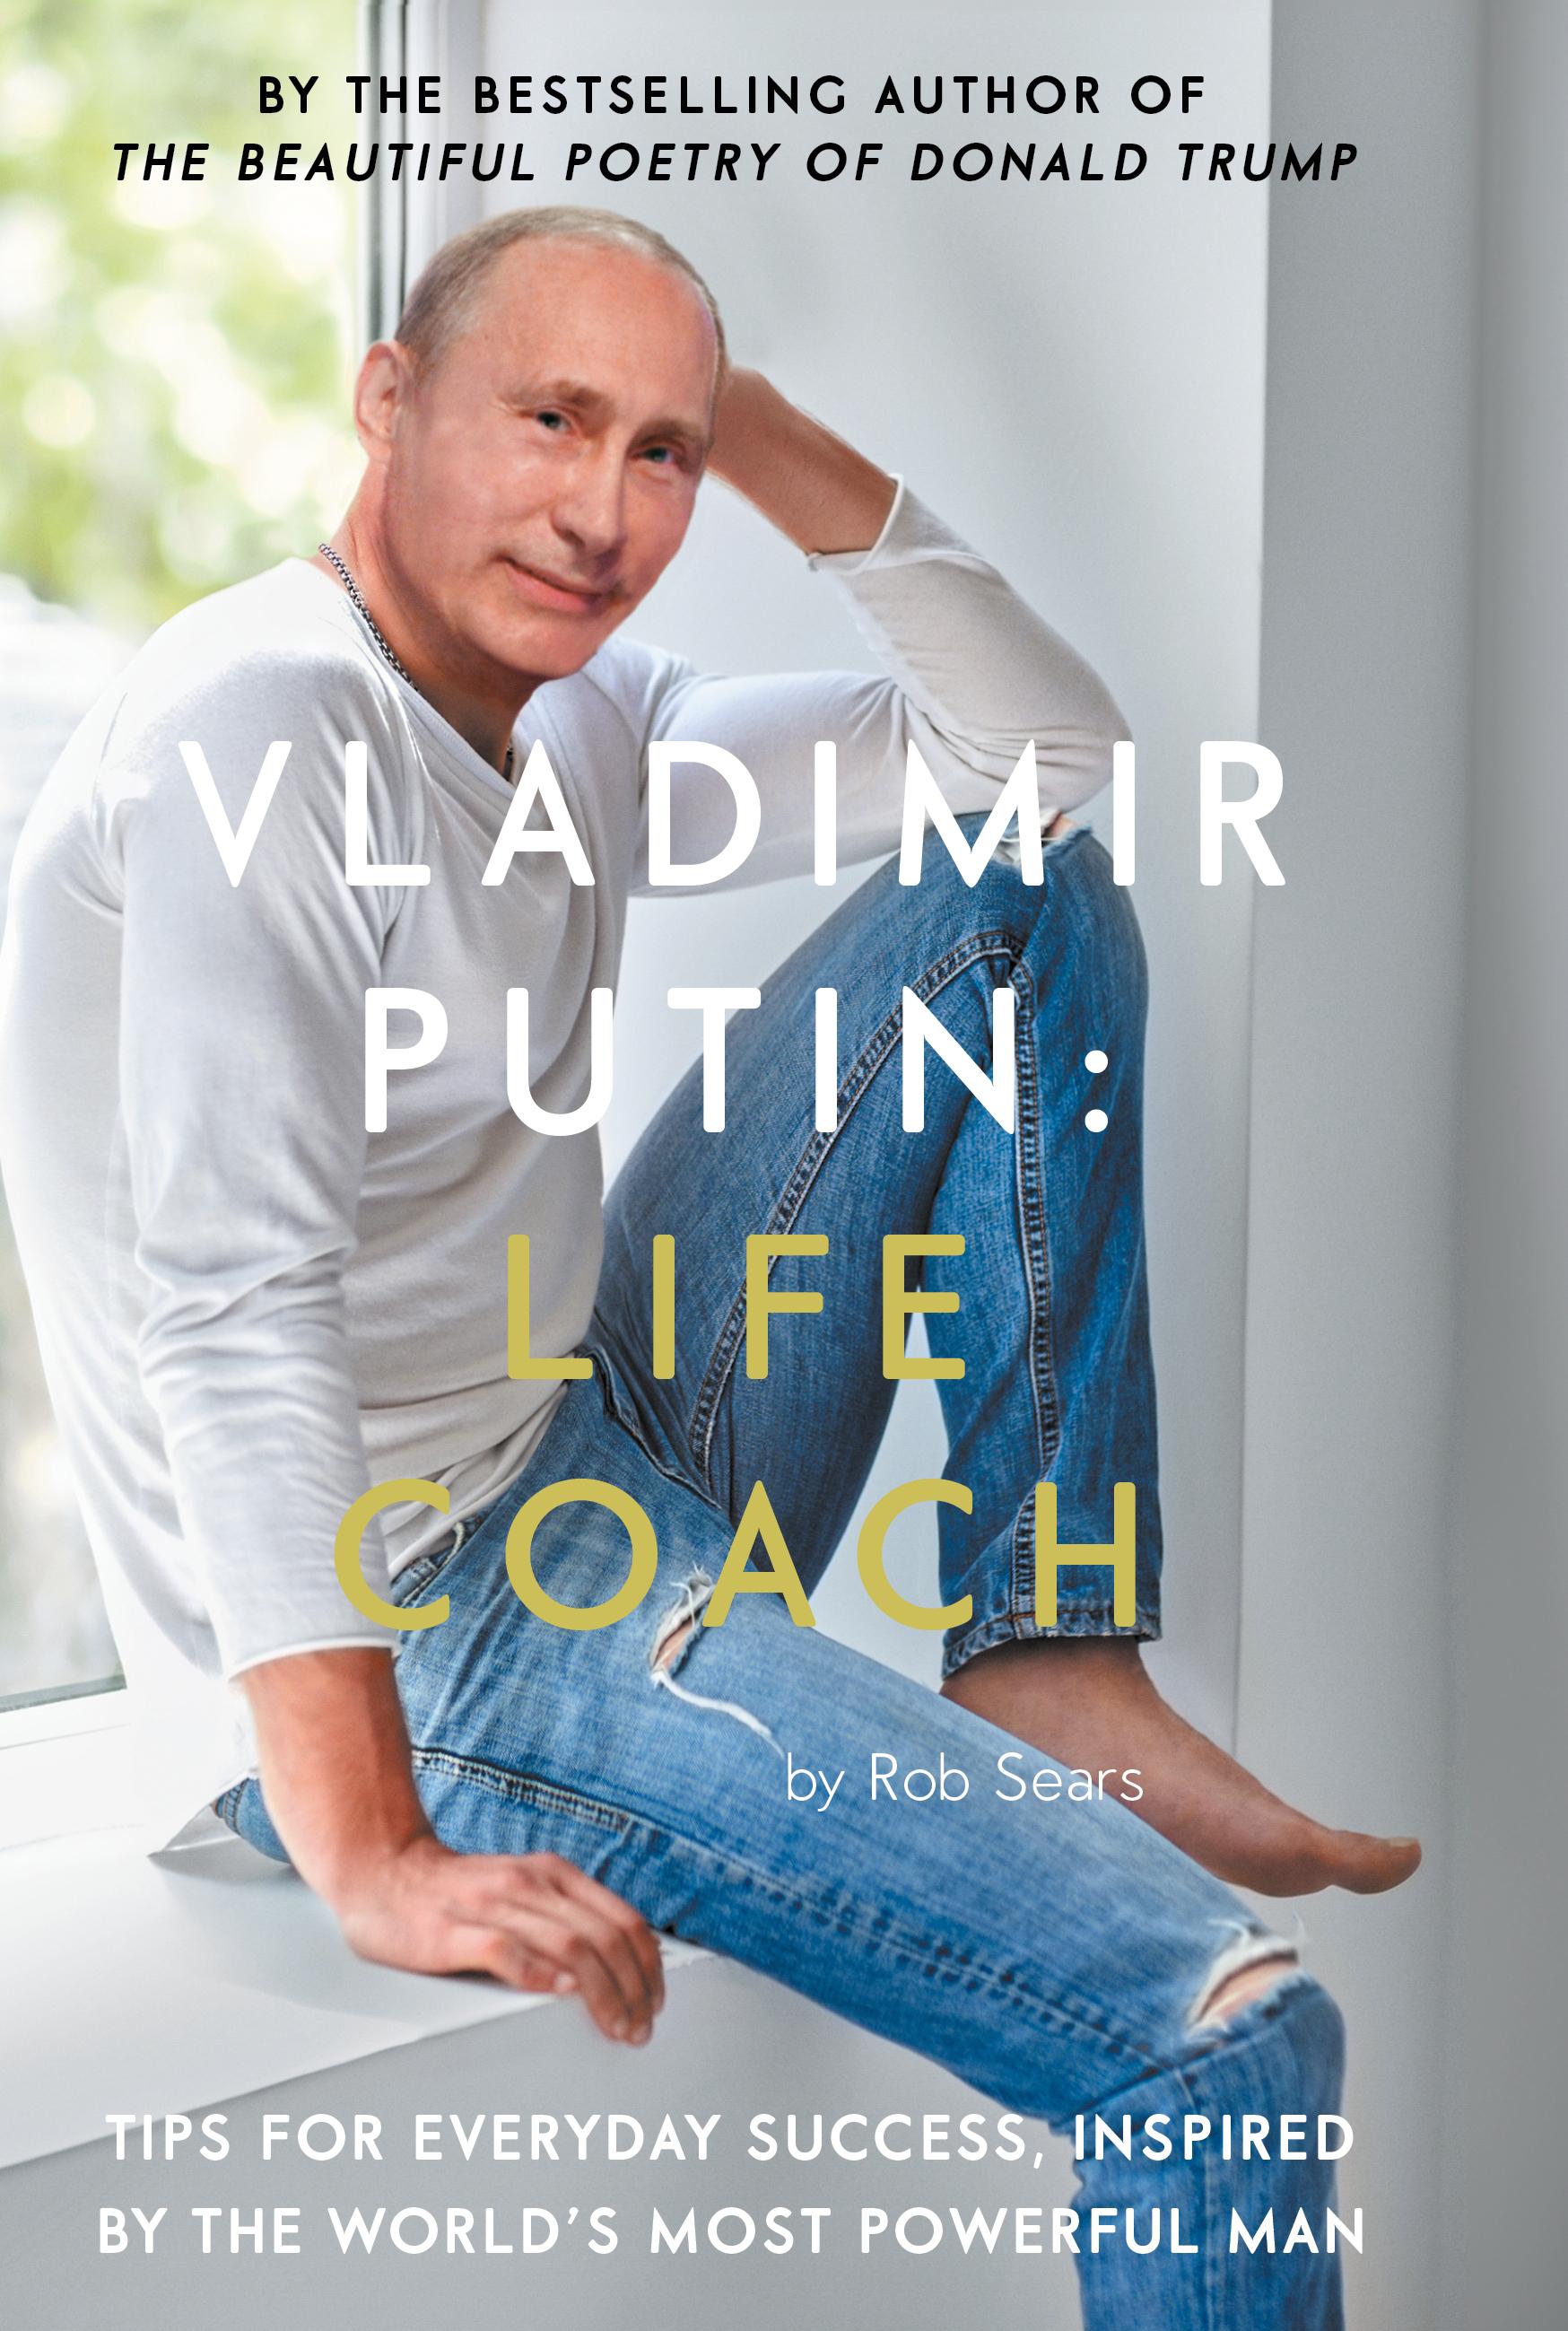 Vladimir Putin Life Coach Rob Sears 9781786894694 Allen Unwin Australia